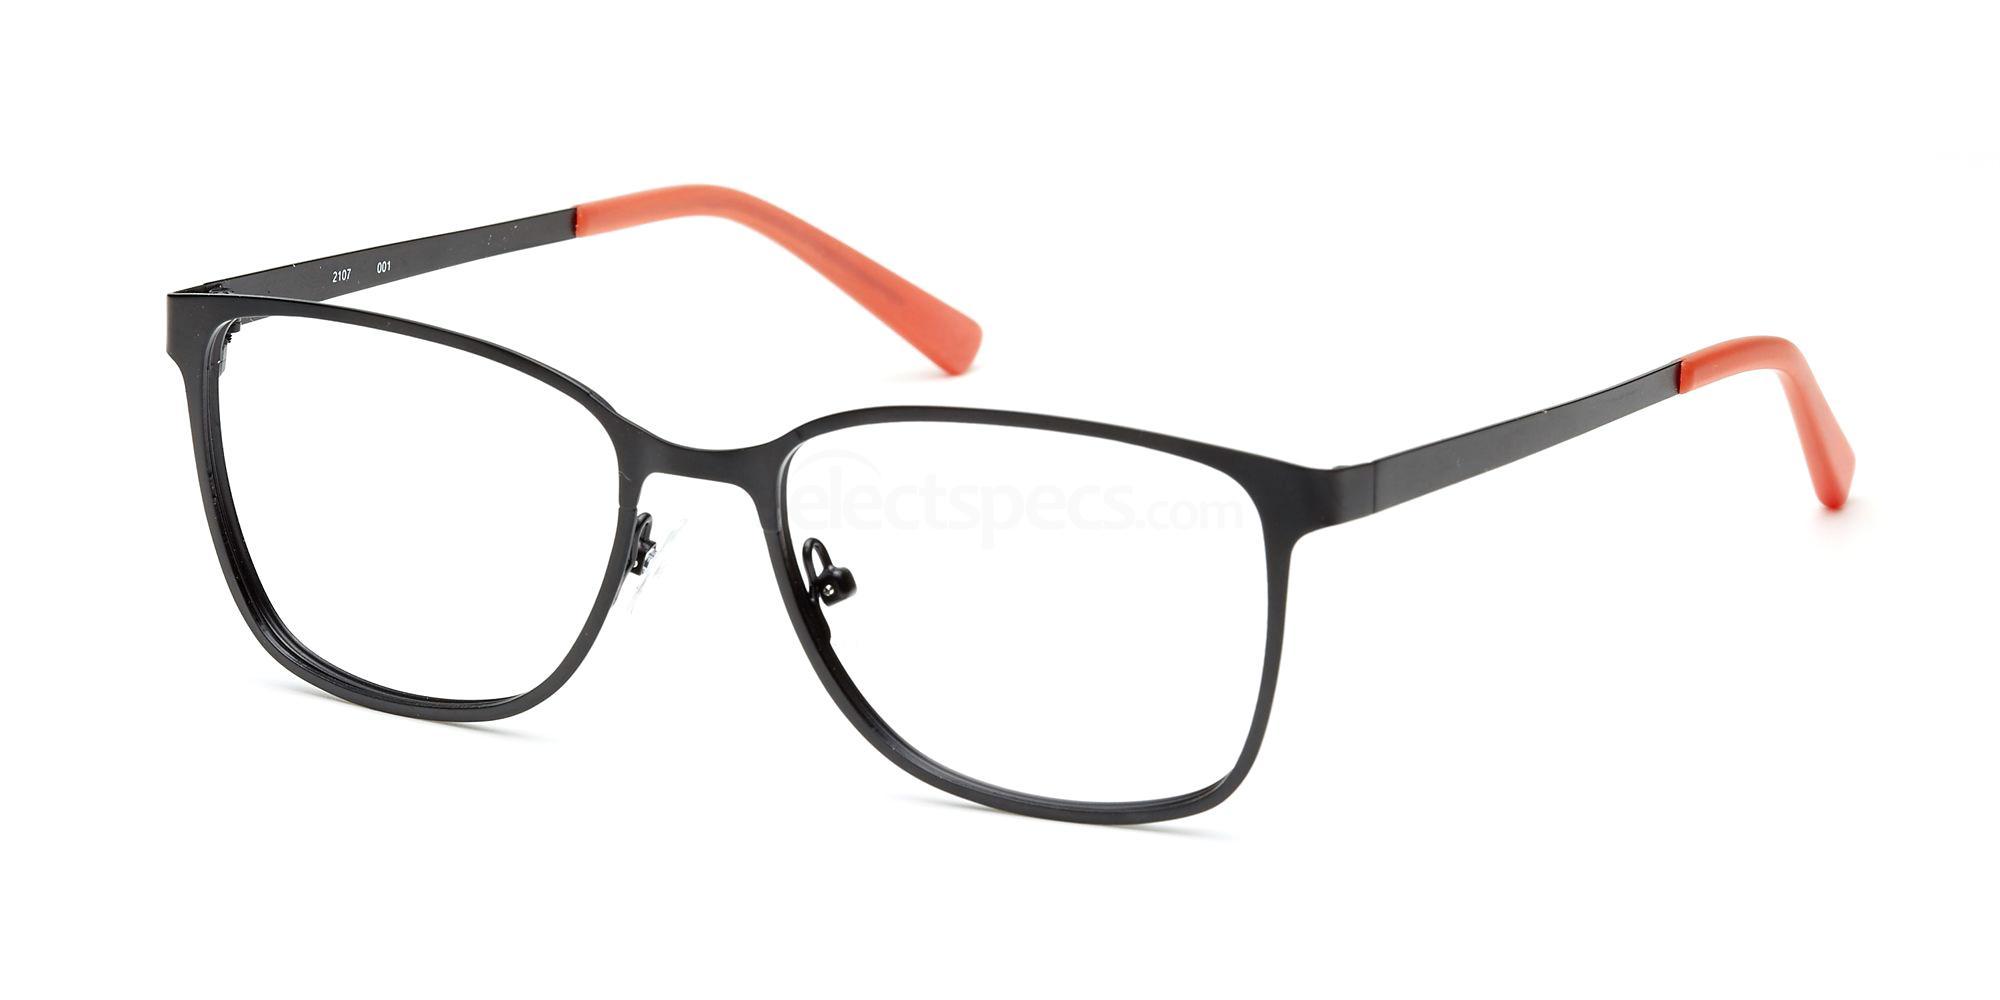 C1 FLX2107 Glasses, Flextra